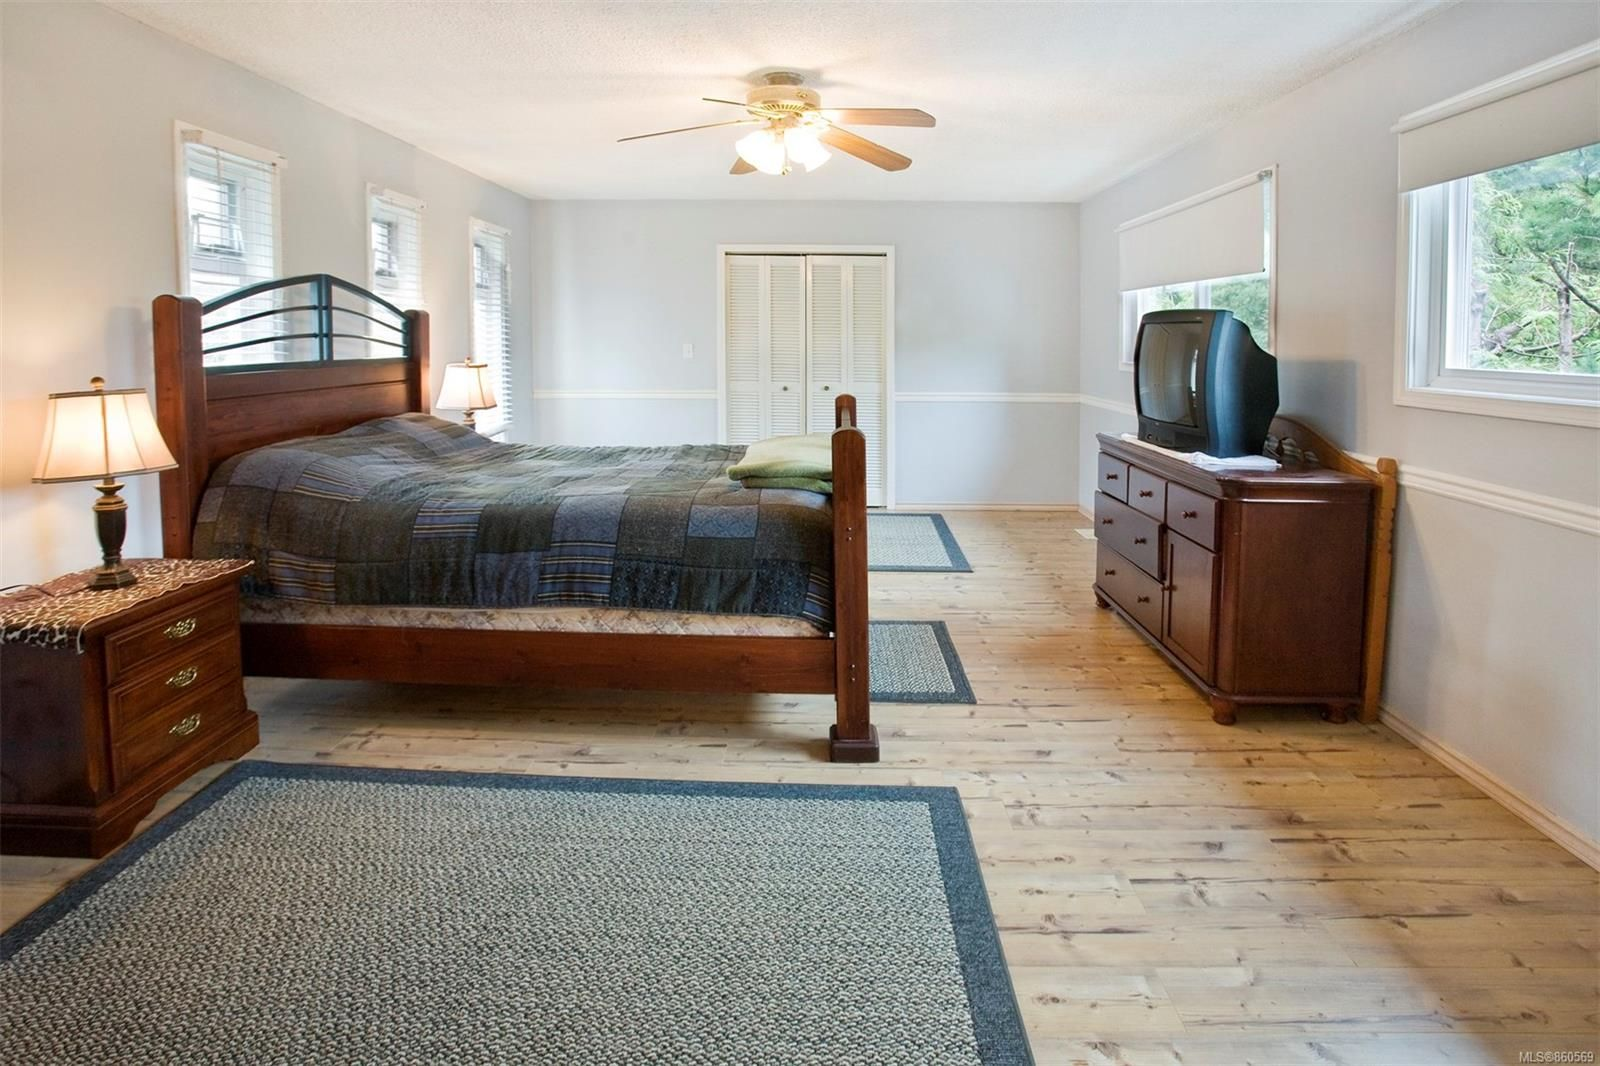 Photo 8: Photos: 4156 Ravenhill Ave in : PA Port Alberni House for sale (Port Alberni)  : MLS®# 860569